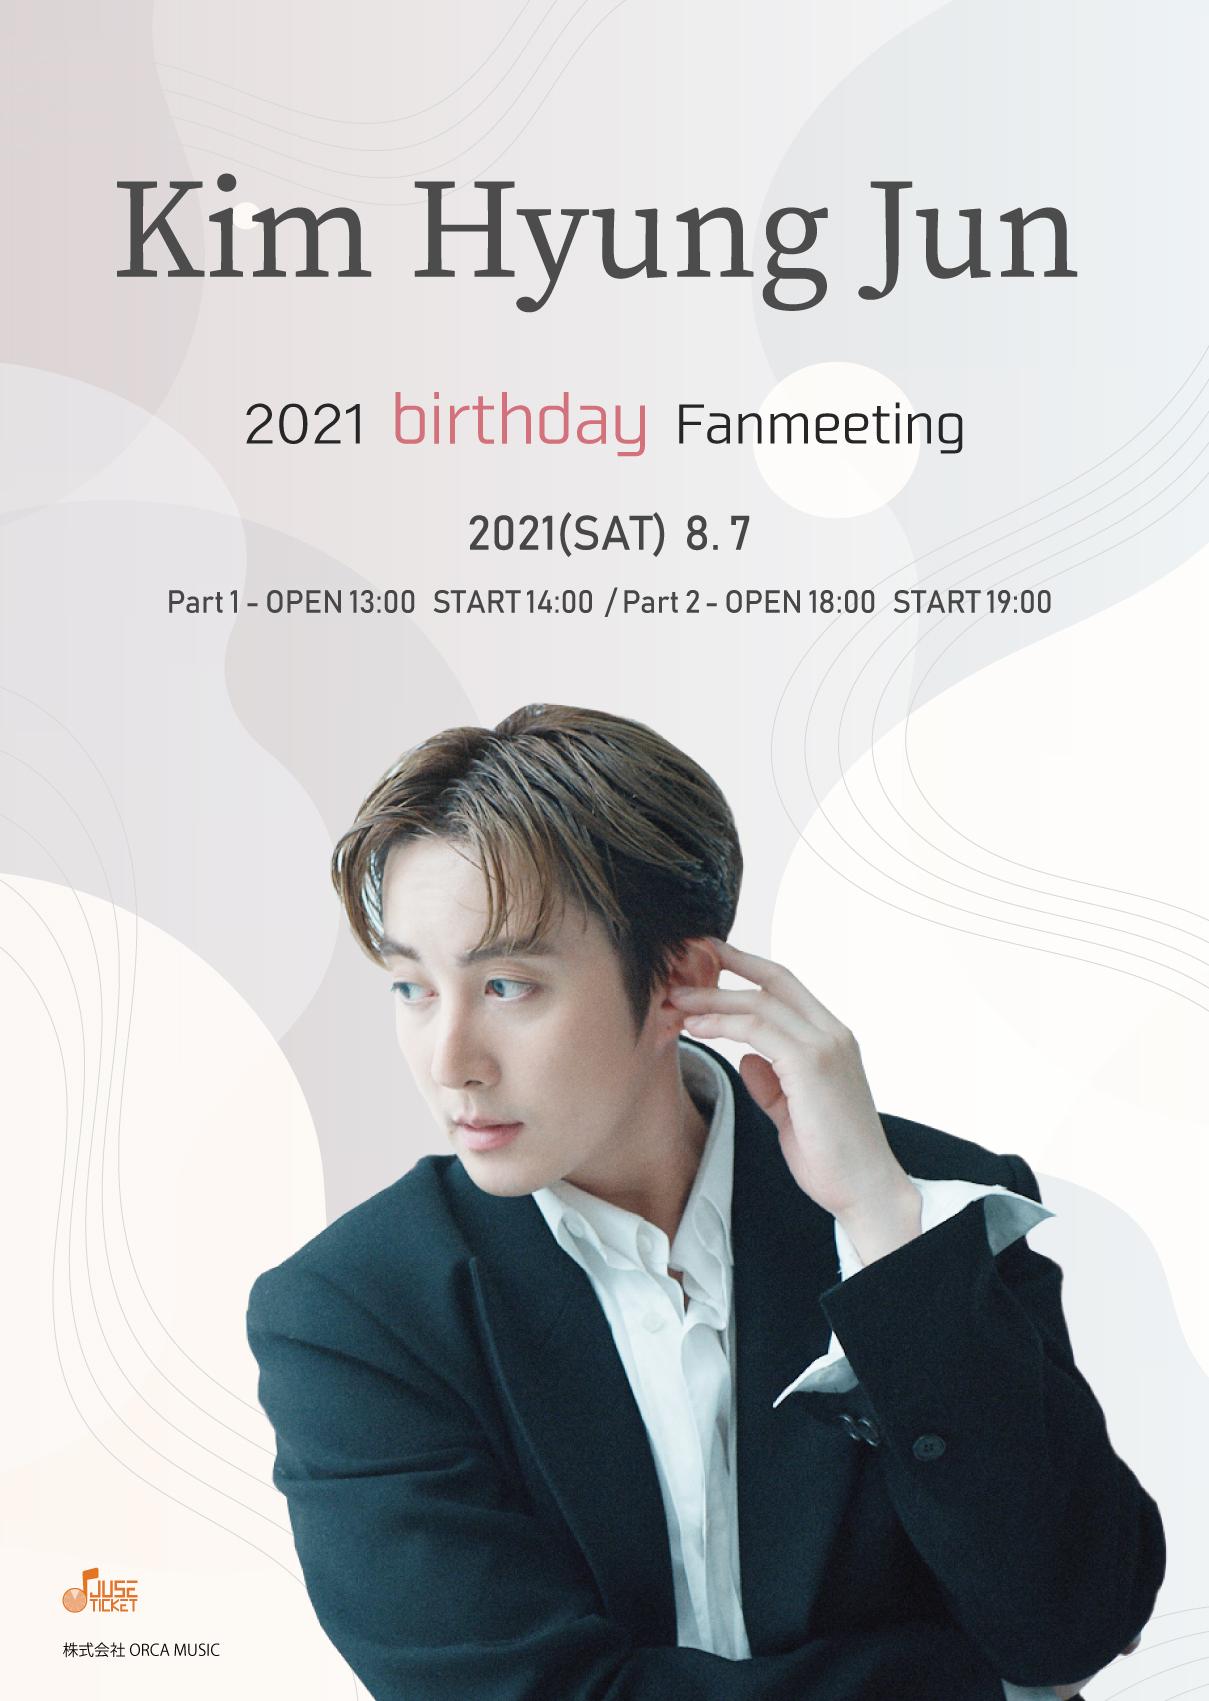 2021 Kim Hyung Jun birthday Fanmeeting [2部]